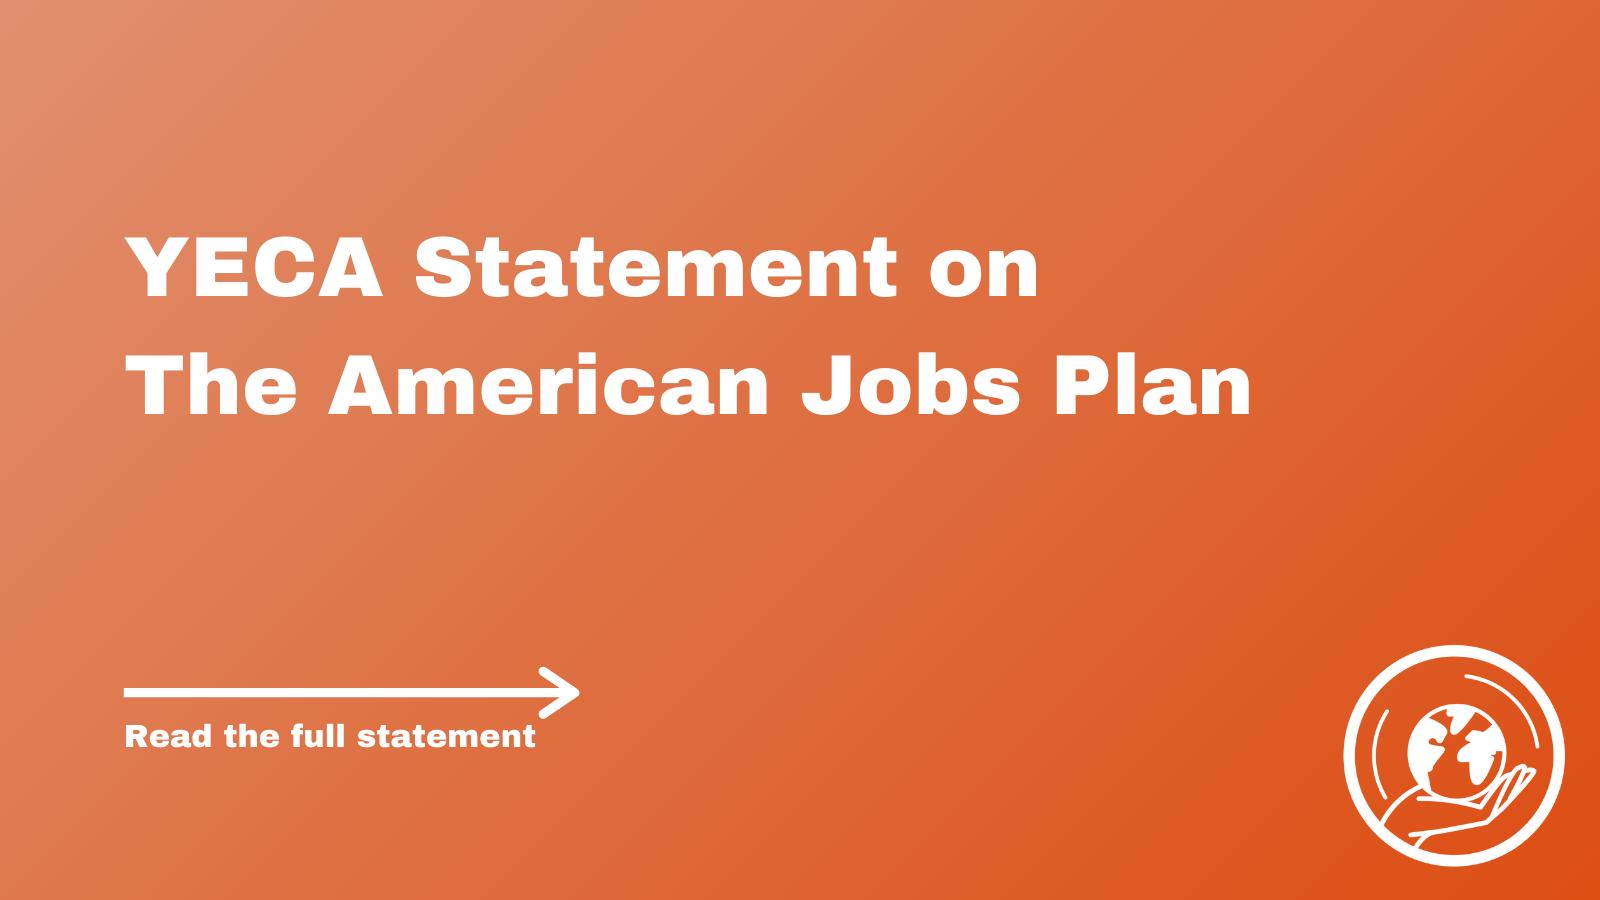 YECA Statement on The American Jobs Plan